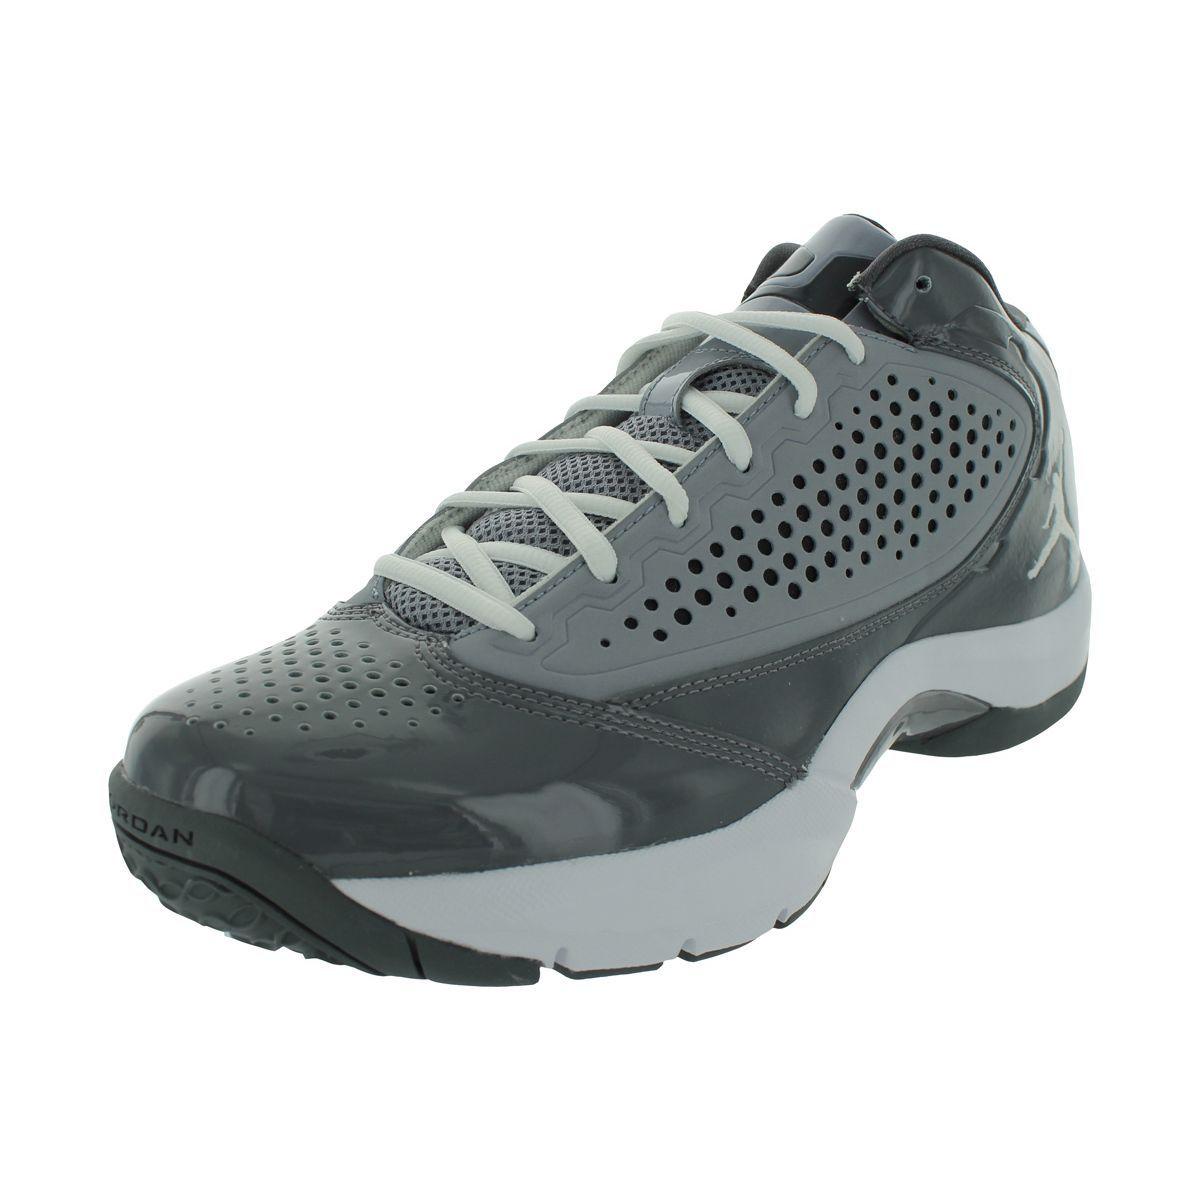 bda11c91ab0548 Nike Jordan D Reign Basketball Shoe